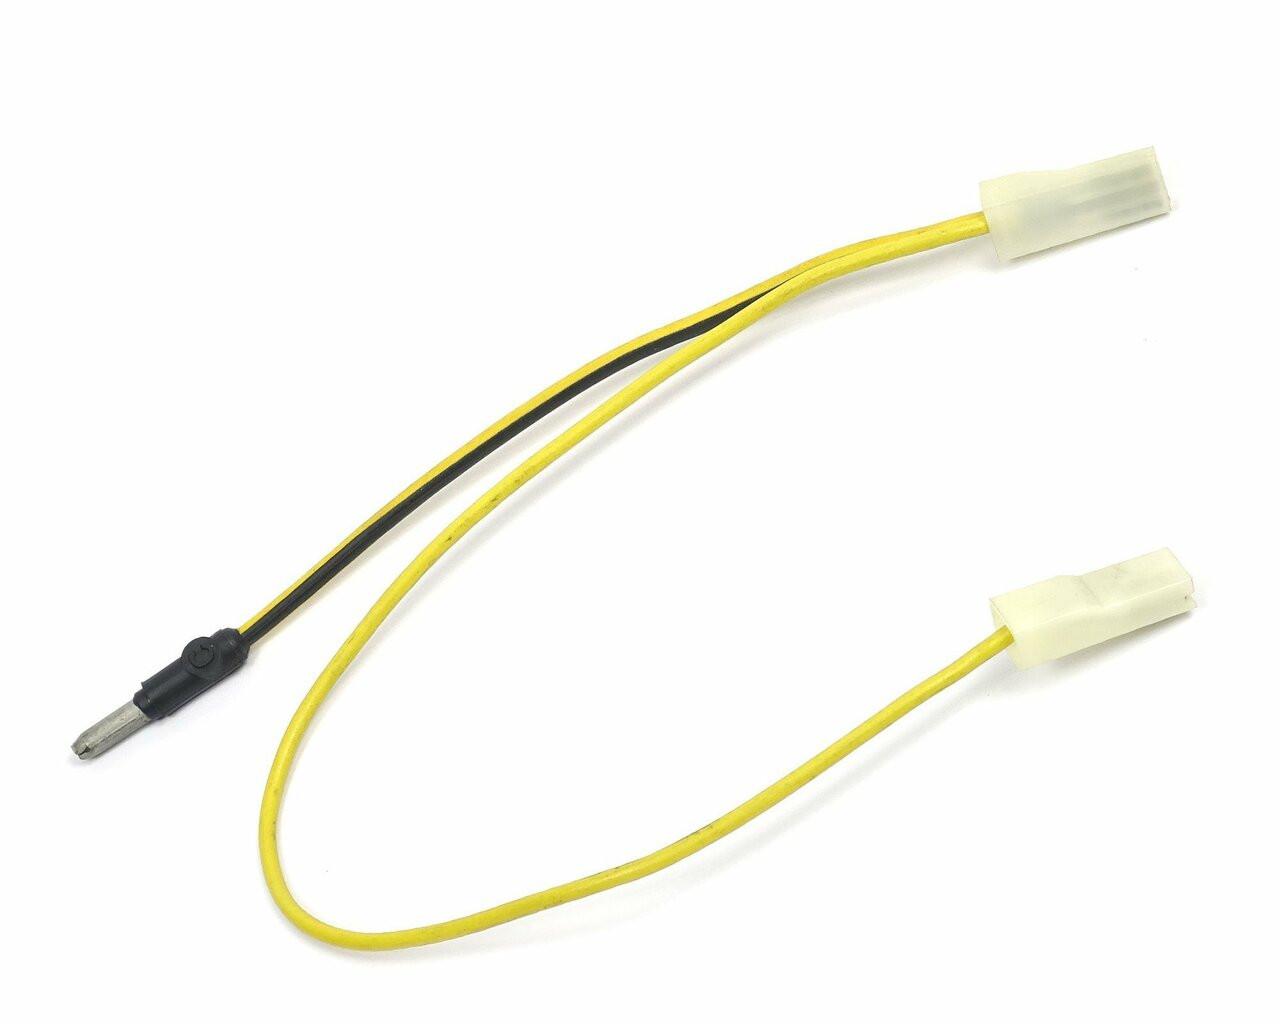 FIAT Spider Wire Connector Harness | Spider Fiat Wire Harness |  | Auto Ricambi FIAT 124 Spider Parts